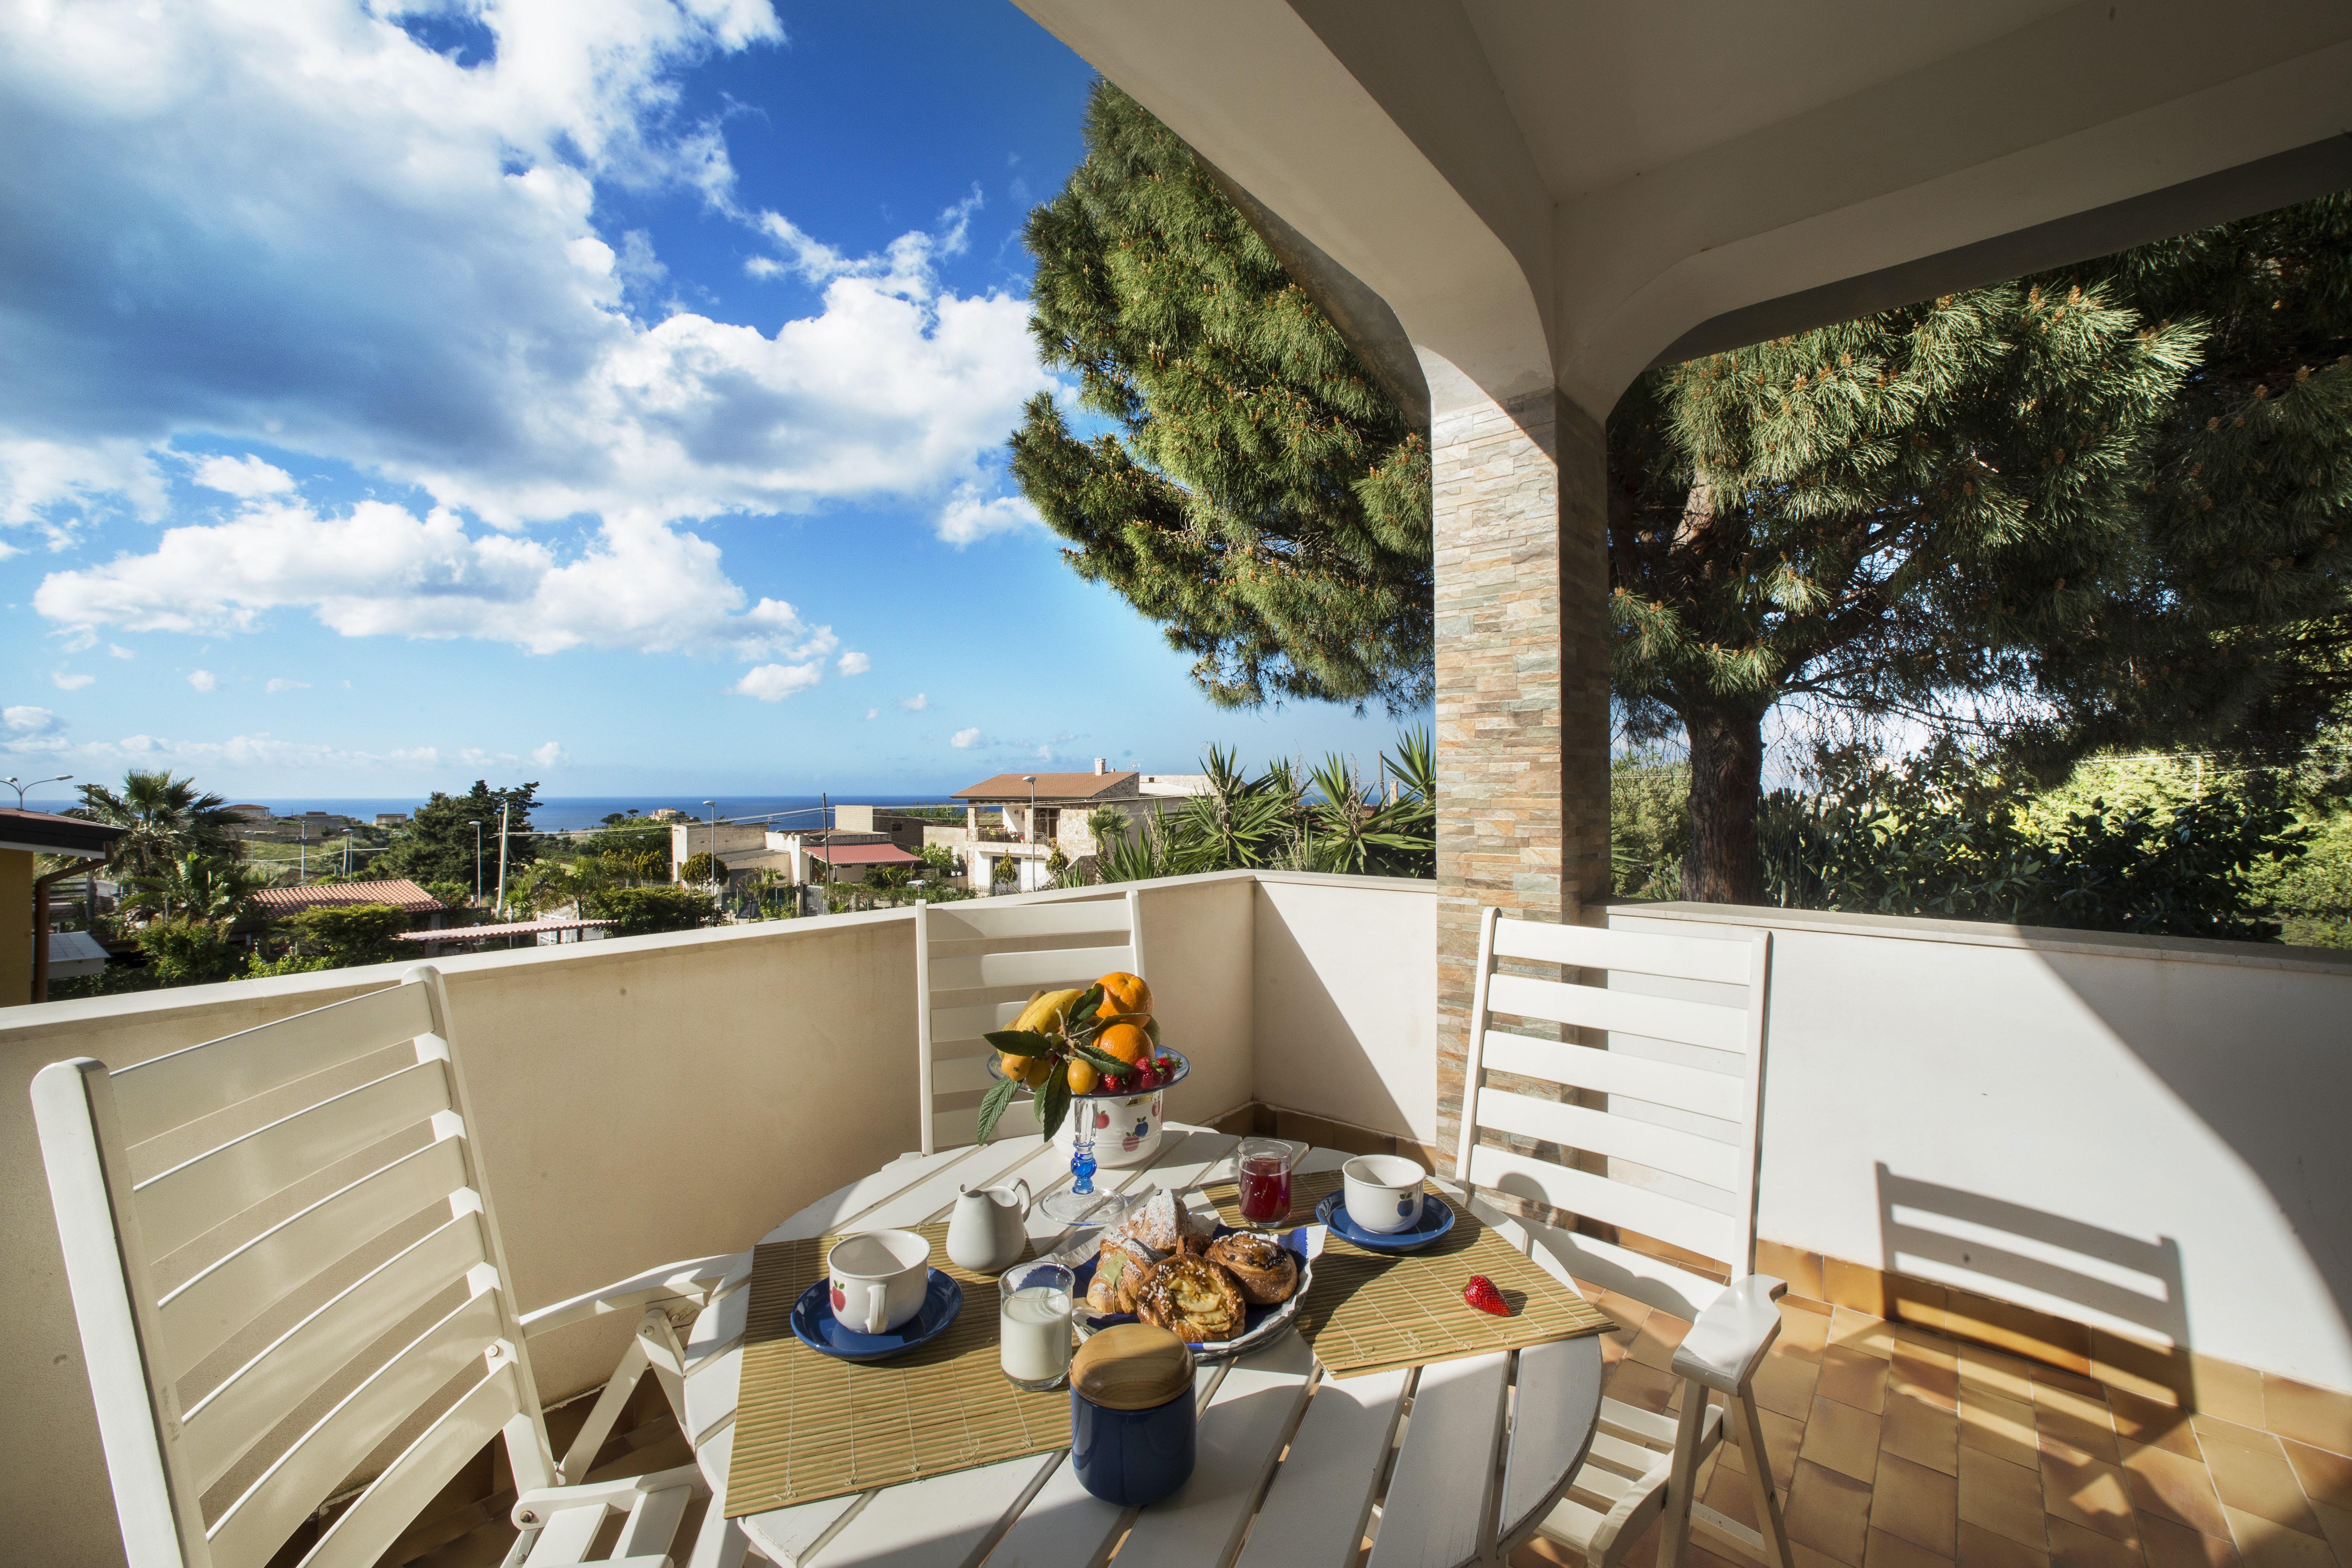 Holiday house Villa Scampati 7 Plätze am Meer mit Garten, Grill und Parkplatz (2388901), Alcamo, Trapani, Sicily, Italy, picture 1